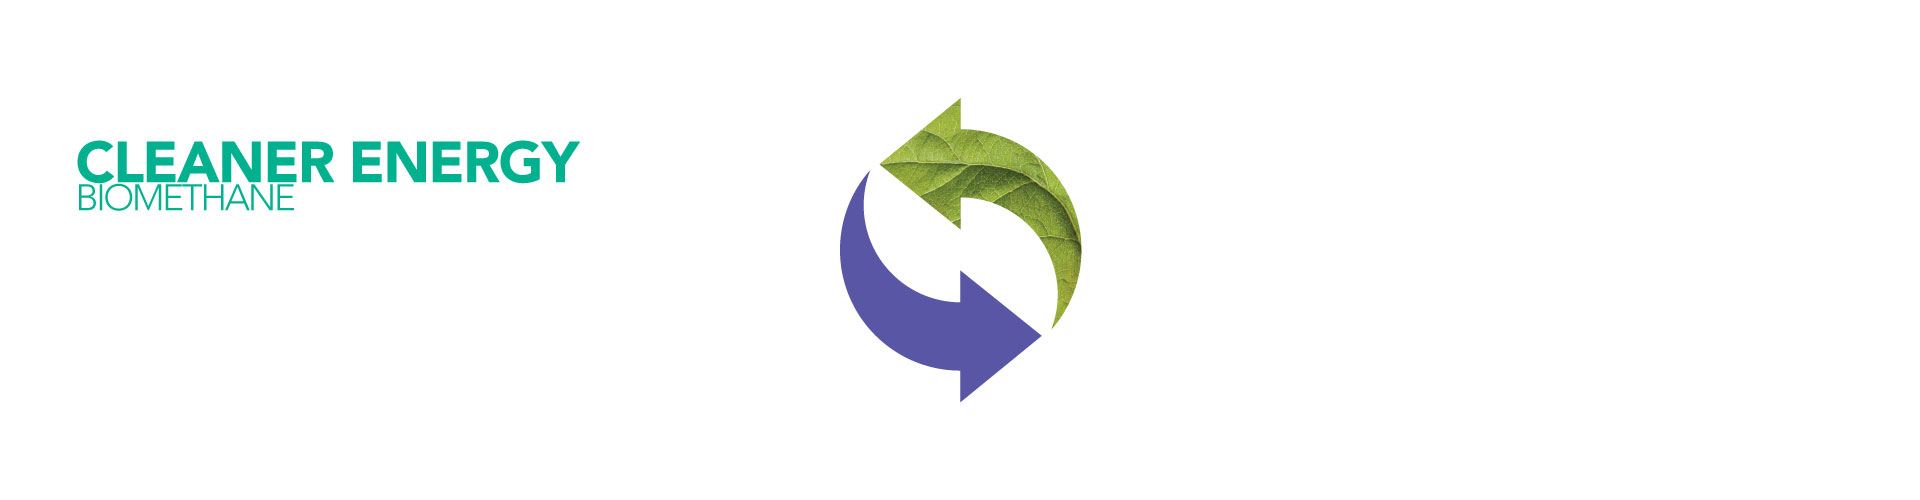 CLEANER ENERGY biomethane